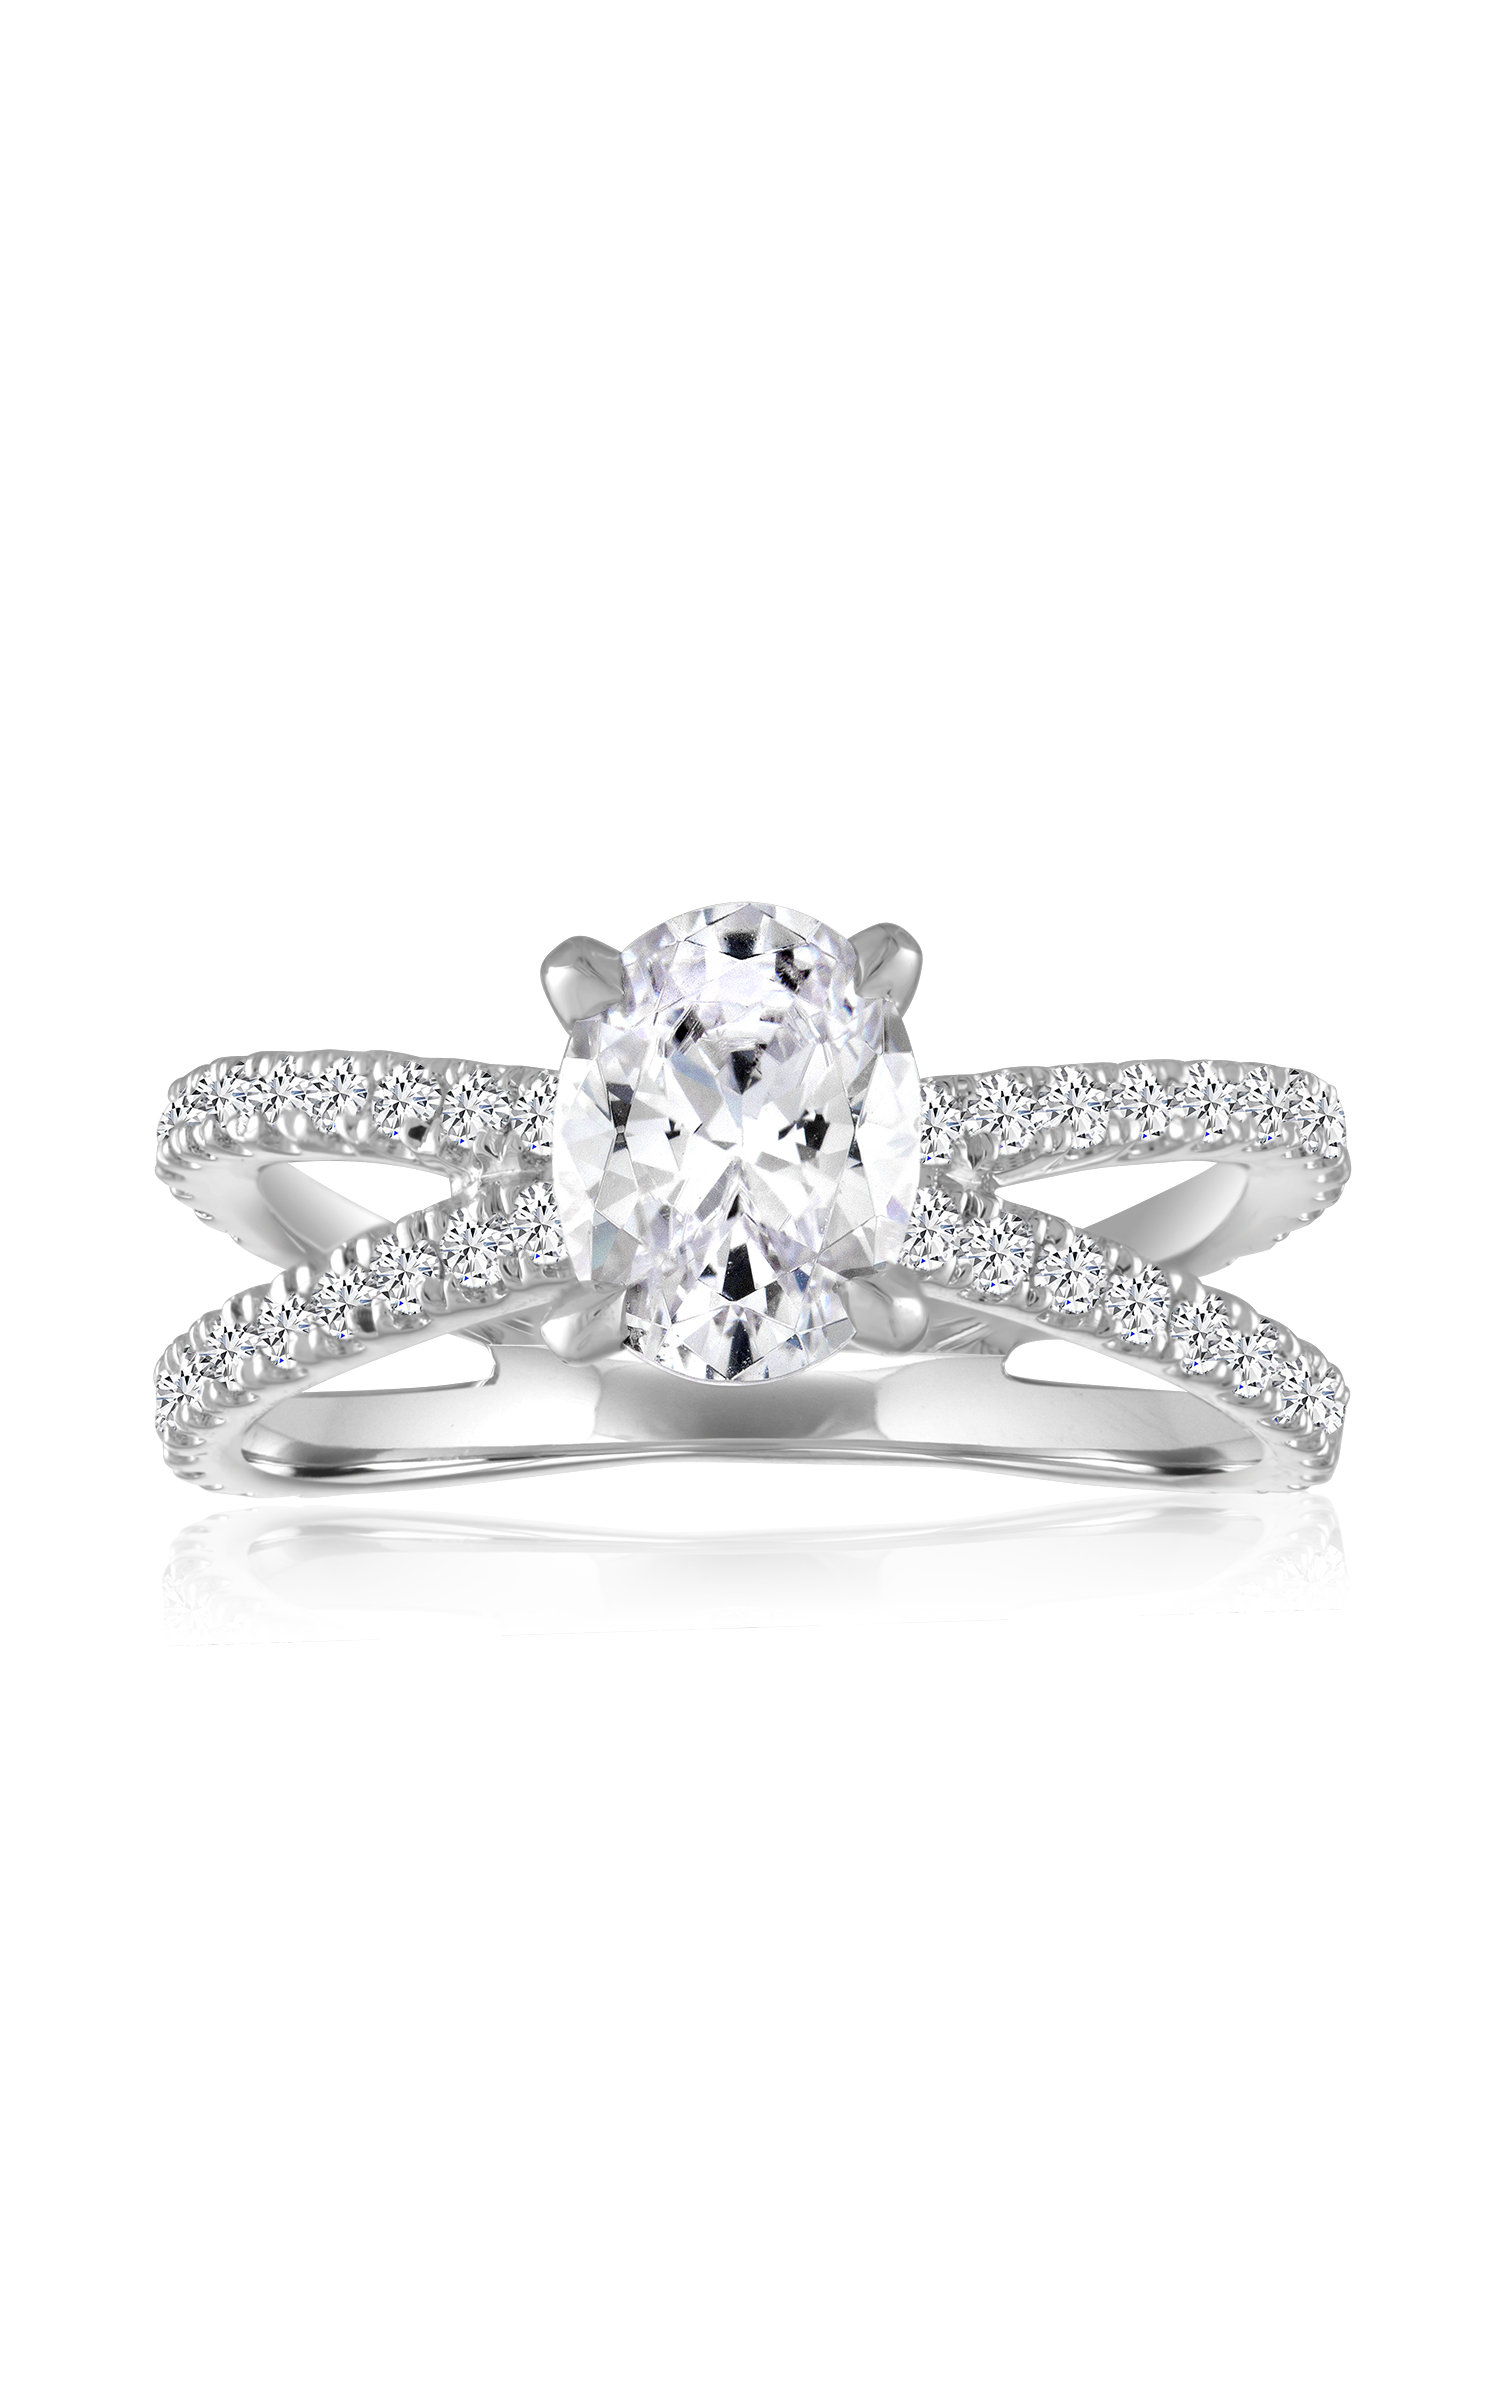 Imagine Bridal Engagement Rings 63555D-5 8 product image